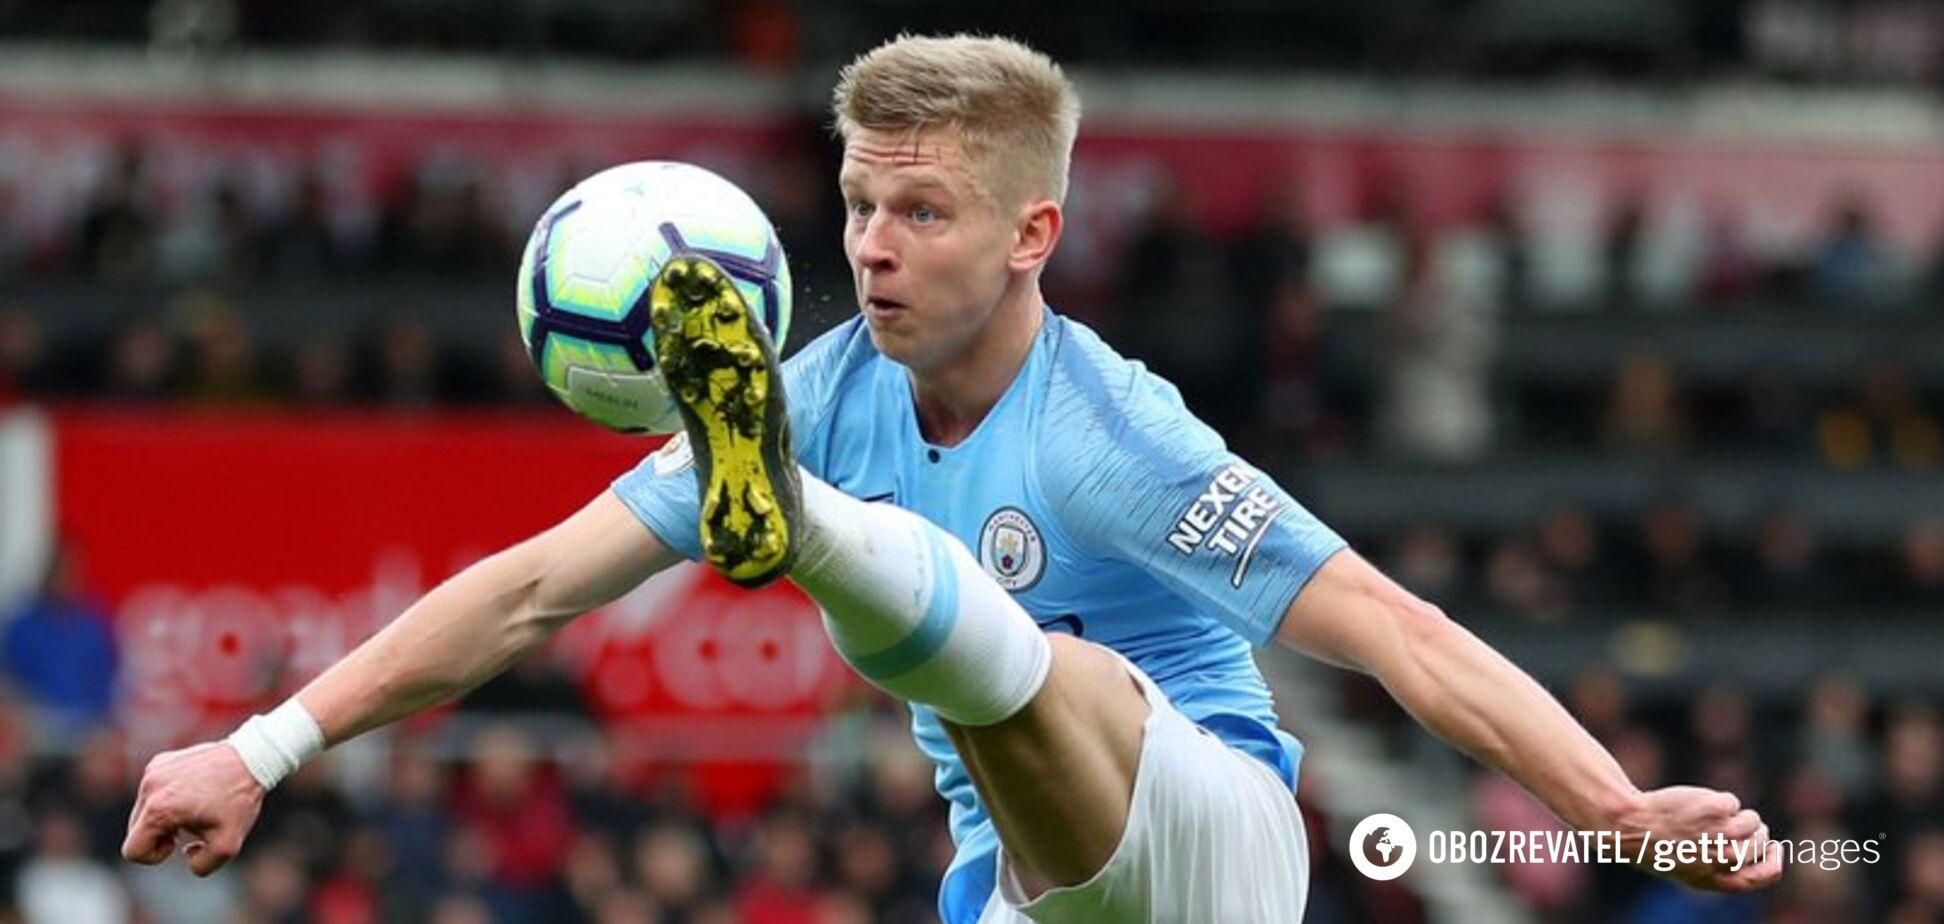 'Манчестер Сити' принял решение по карьере Зинченко